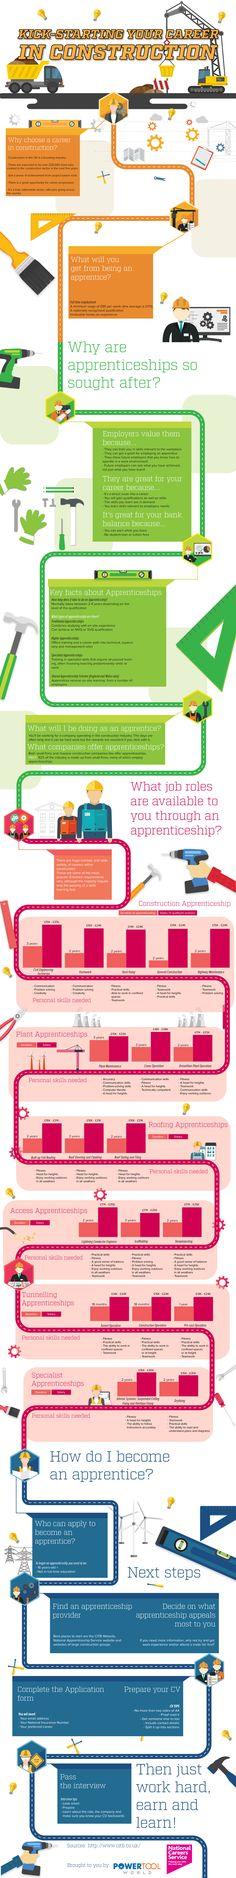 Info on apprenticeships in construction via @Powertoolworld